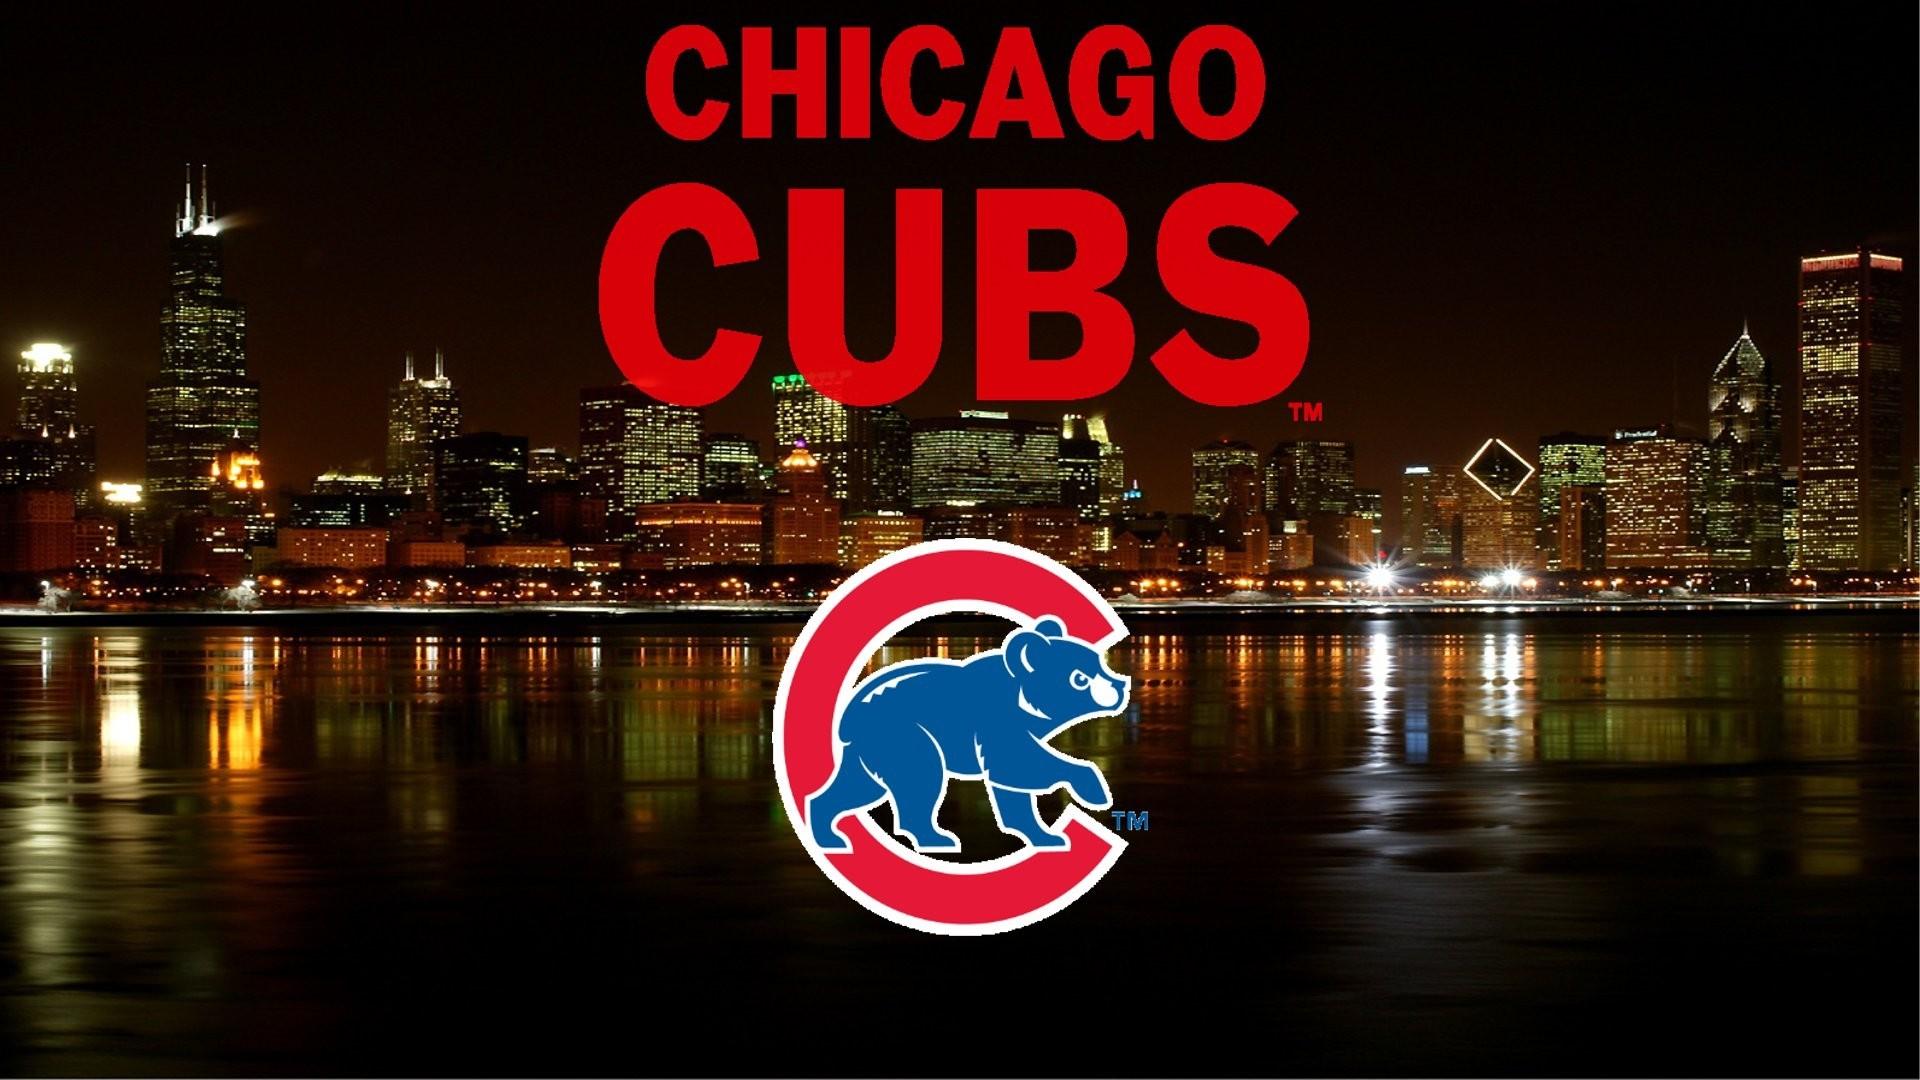 Chicago Cubs Skyline Wallpaper